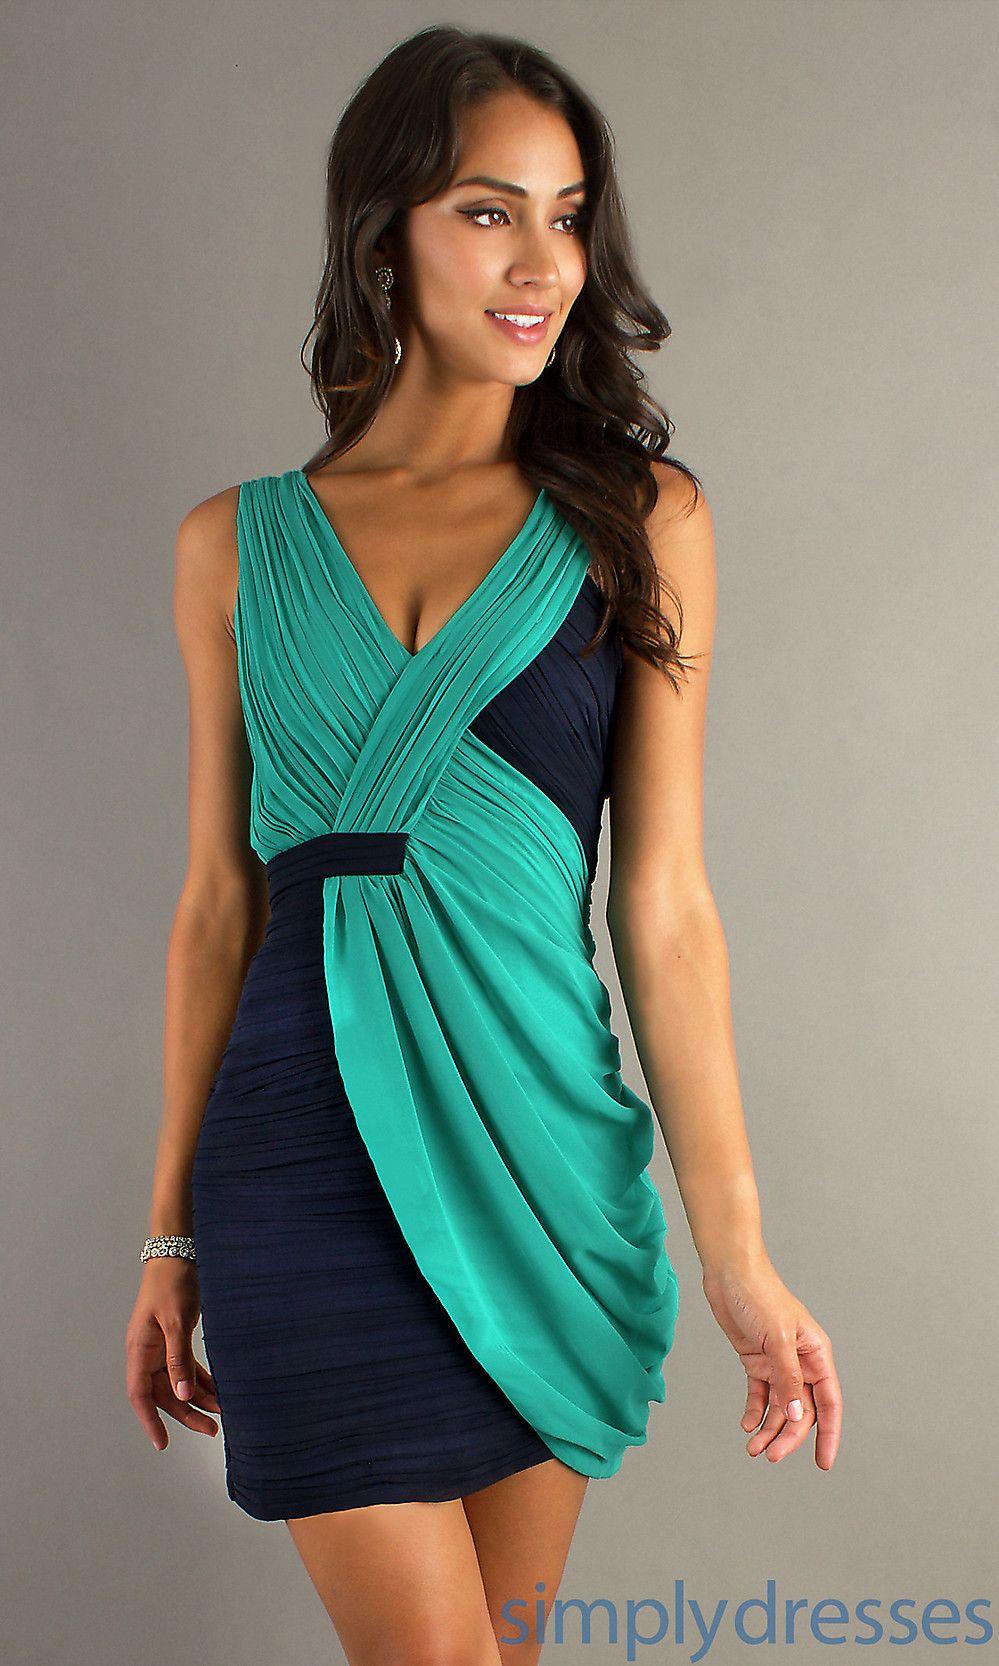 teal dress | Sleeveless Semi Formal Dress, Sleeveless Dresses ...